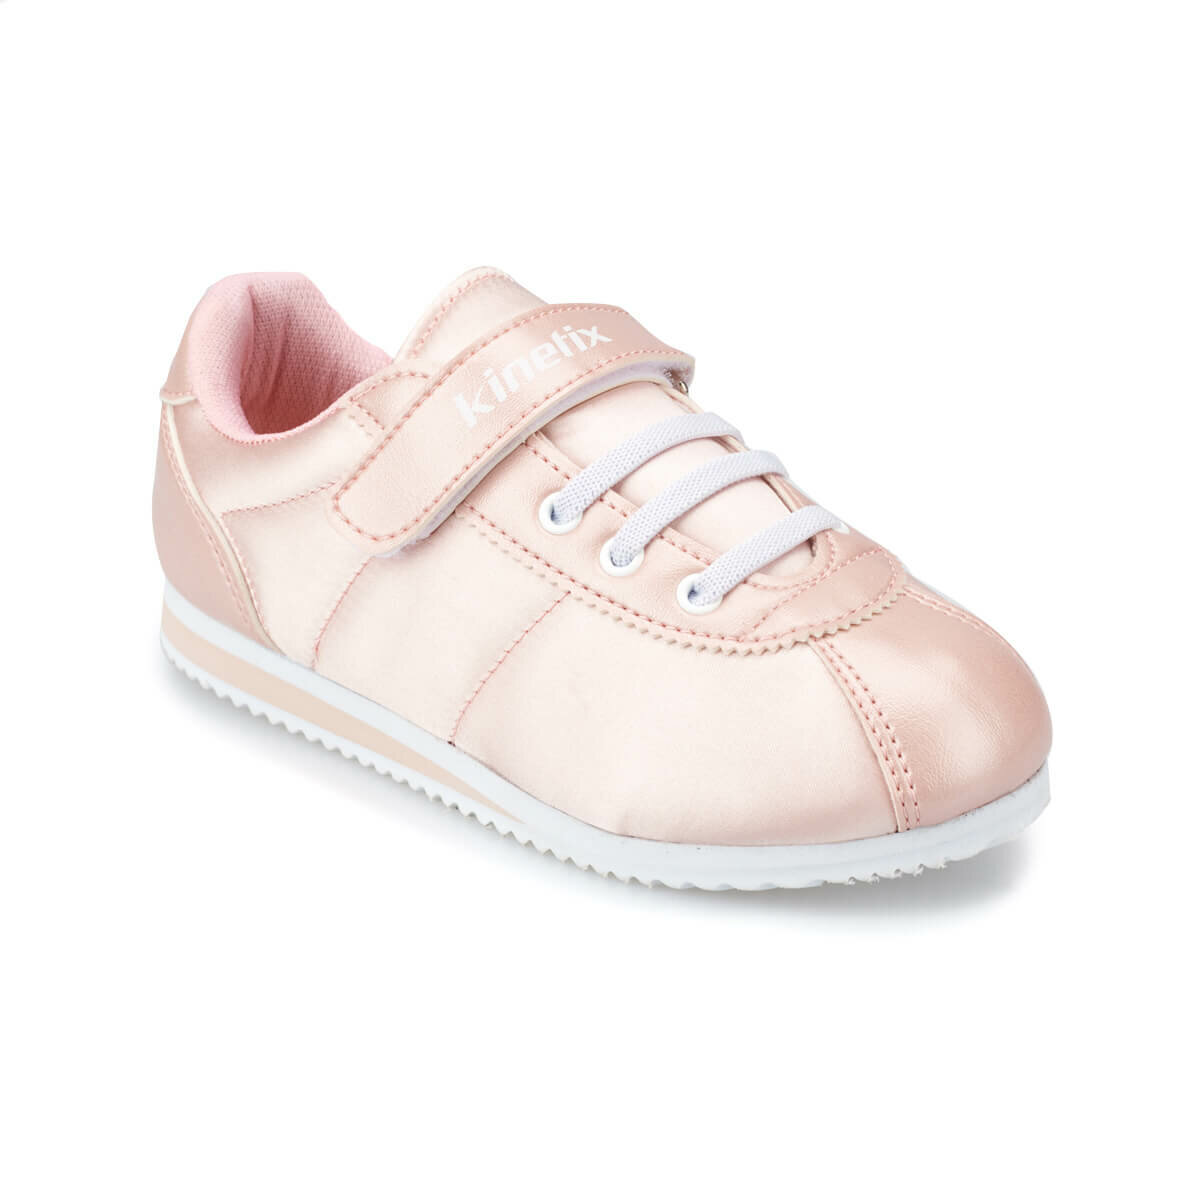 FLO SOPHY J Light Pink Female Child Sneaker Shoes KINETIX